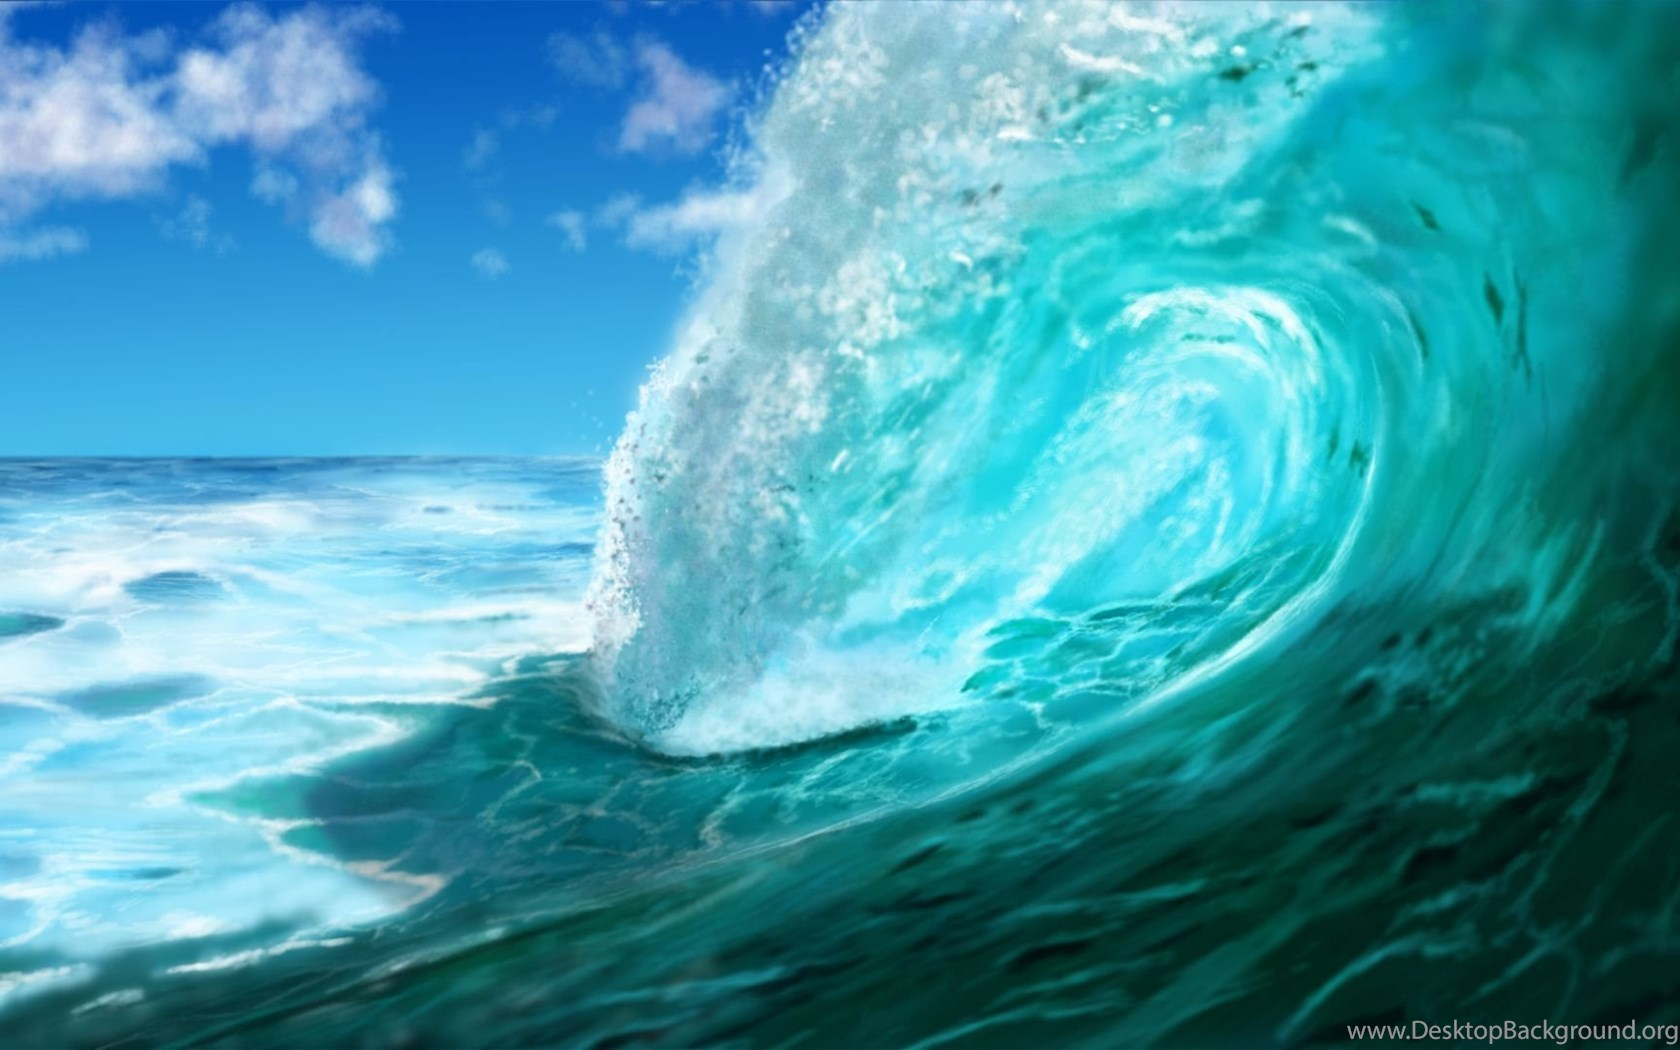 Ocean Waves Wallpapers Tumblr Desktop Background